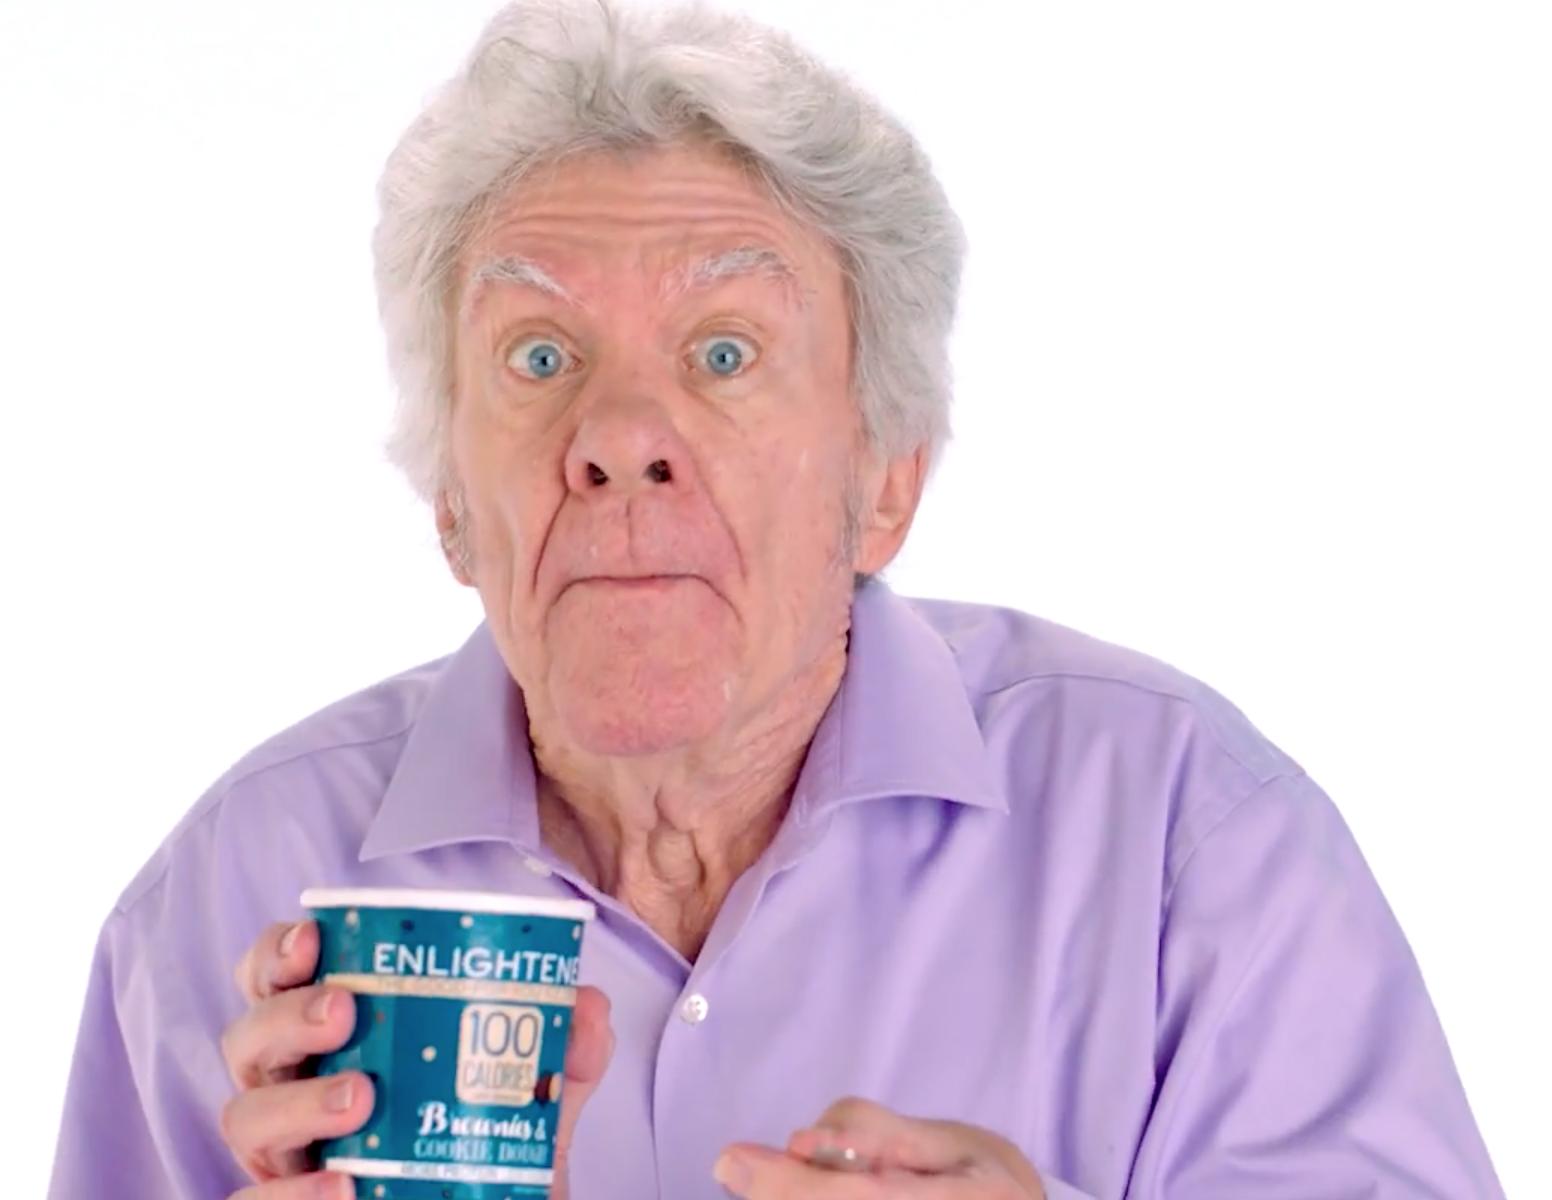 Wheres David?, David Olsen, Enlightened Ice Cream Ad